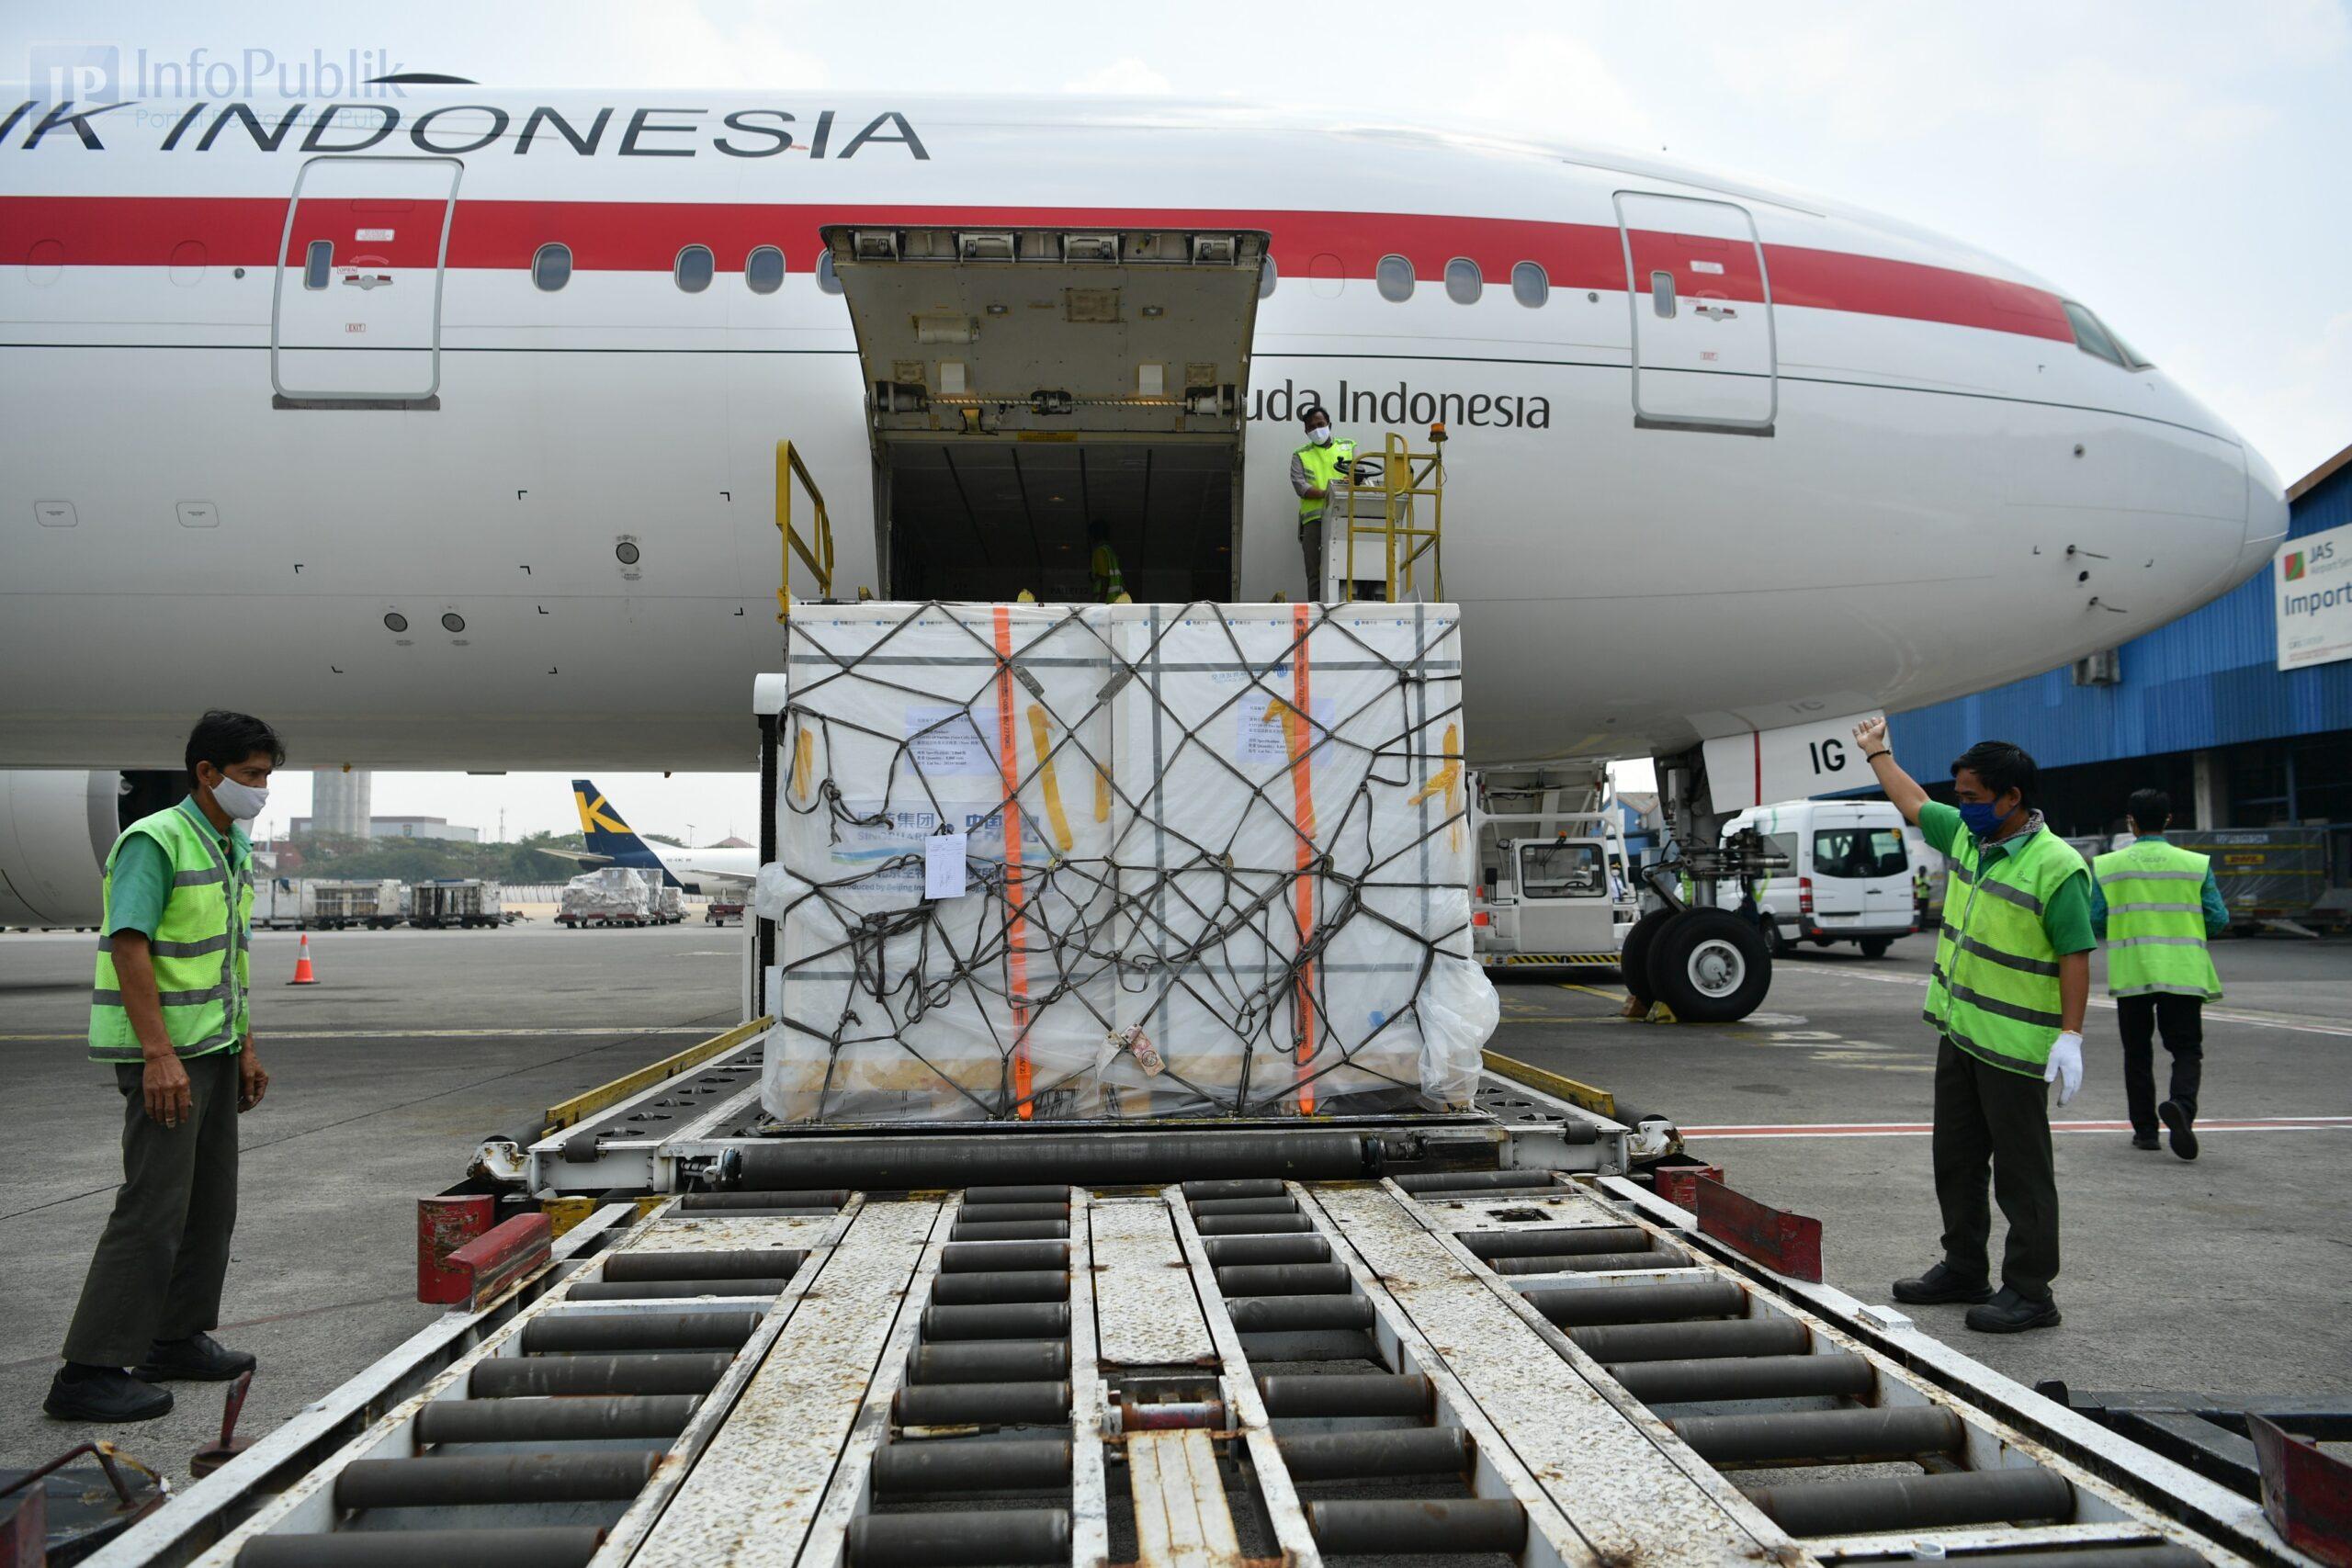 vaksin tiba di indonesia scaled